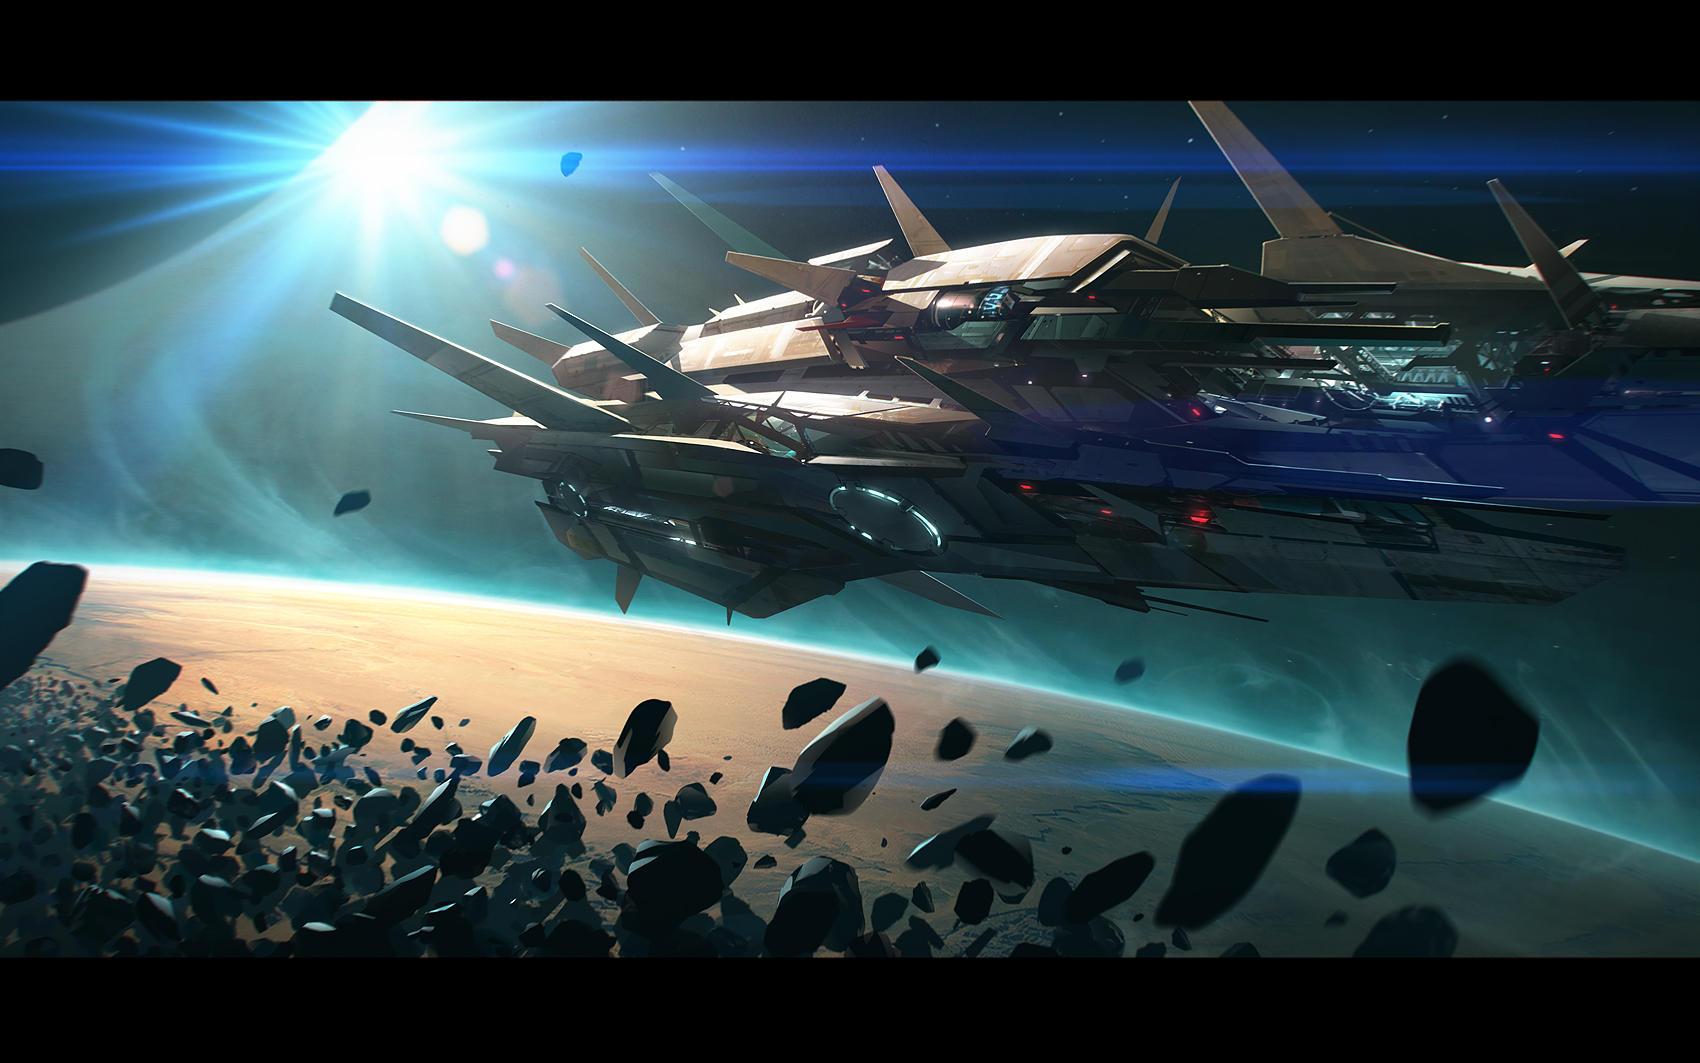 Asteroid shore by jamajurabaev